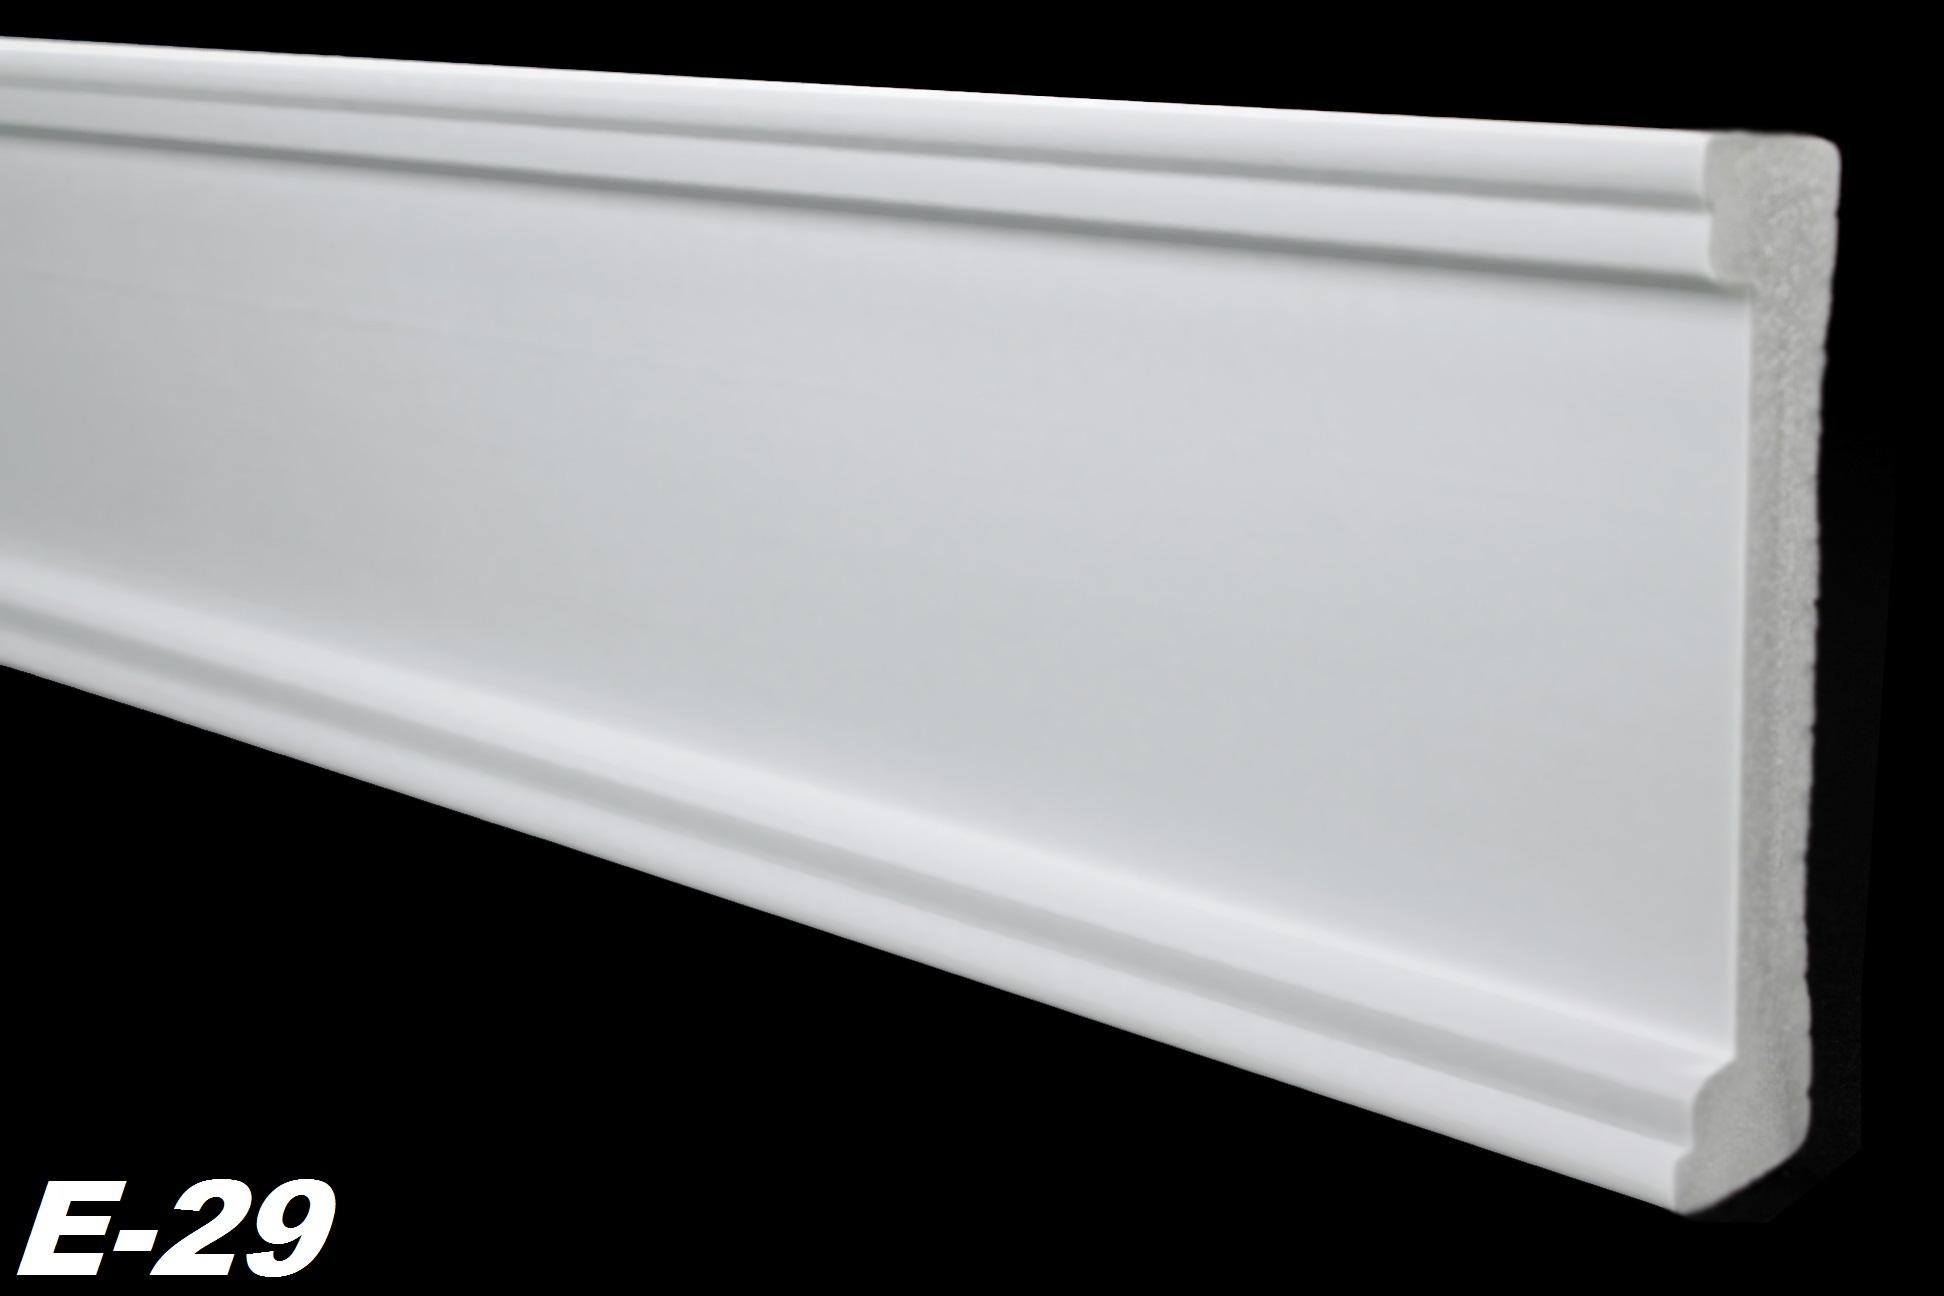 10 meter flachprofile wandleisten leisten wand stuck dekor. Black Bedroom Furniture Sets. Home Design Ideas